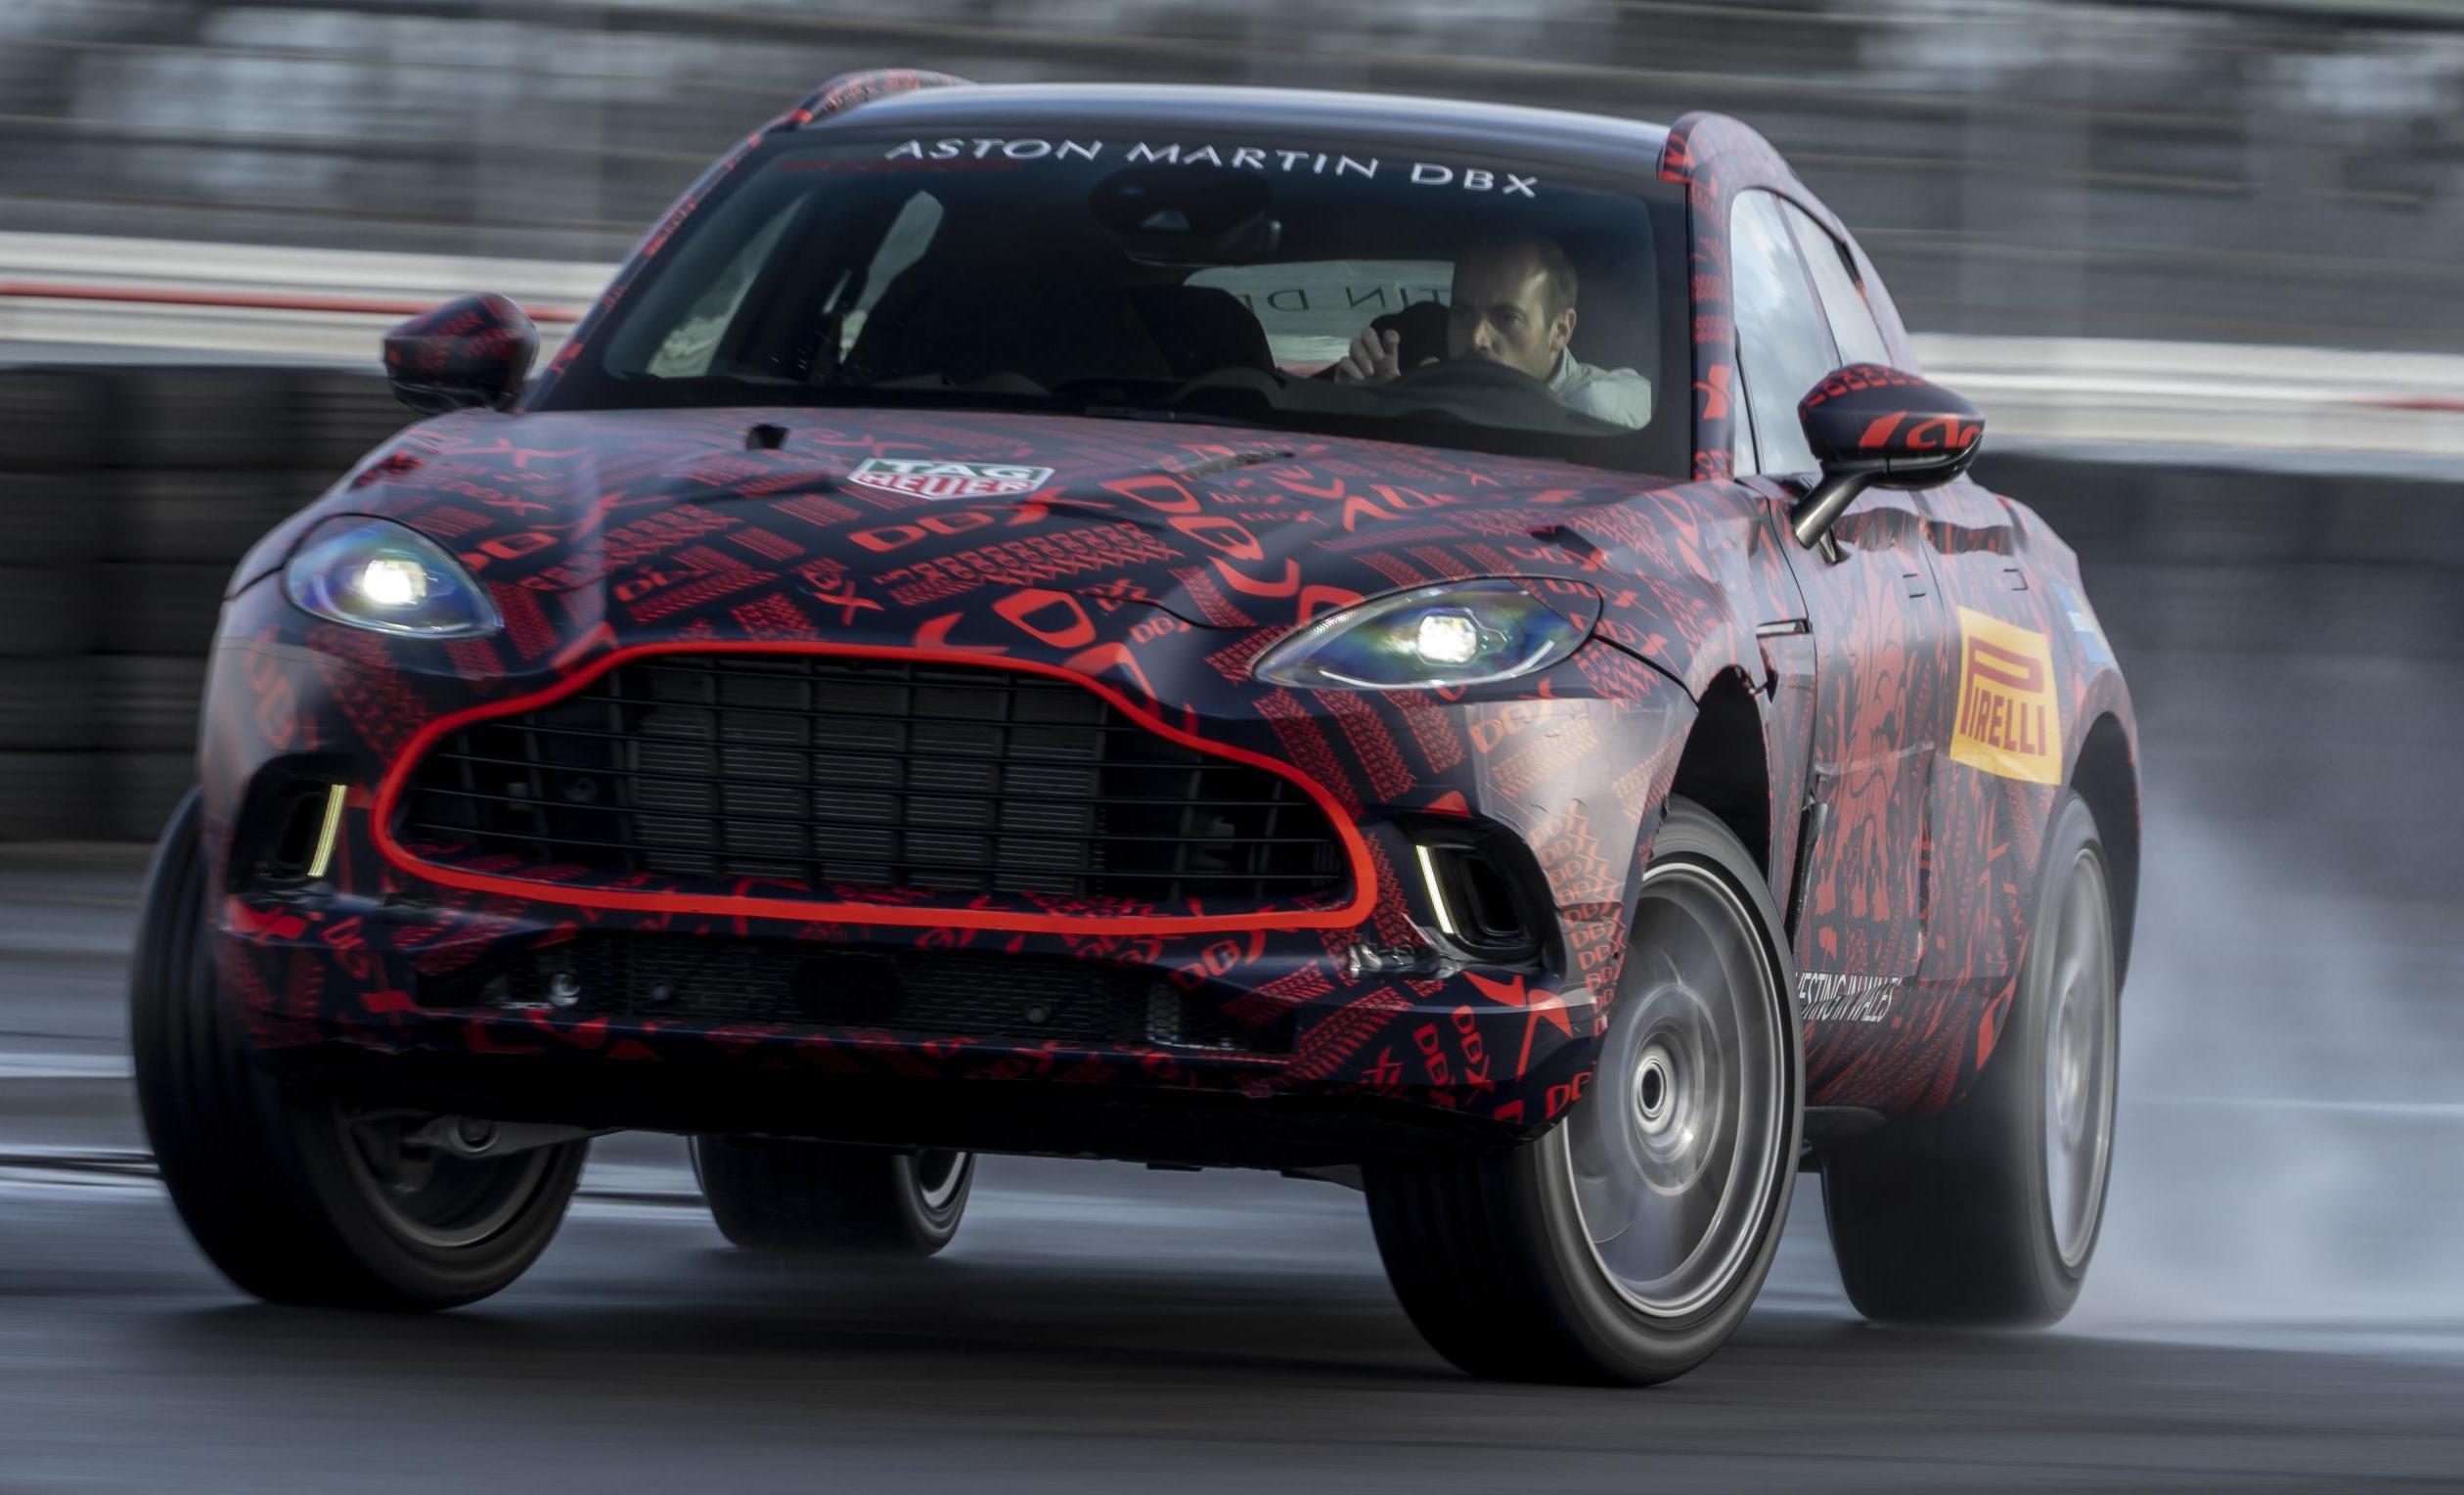 Aston Martin Dbx V8 Specs Confirmed Sub 8min Nurburgring Lap Video Performancedrive